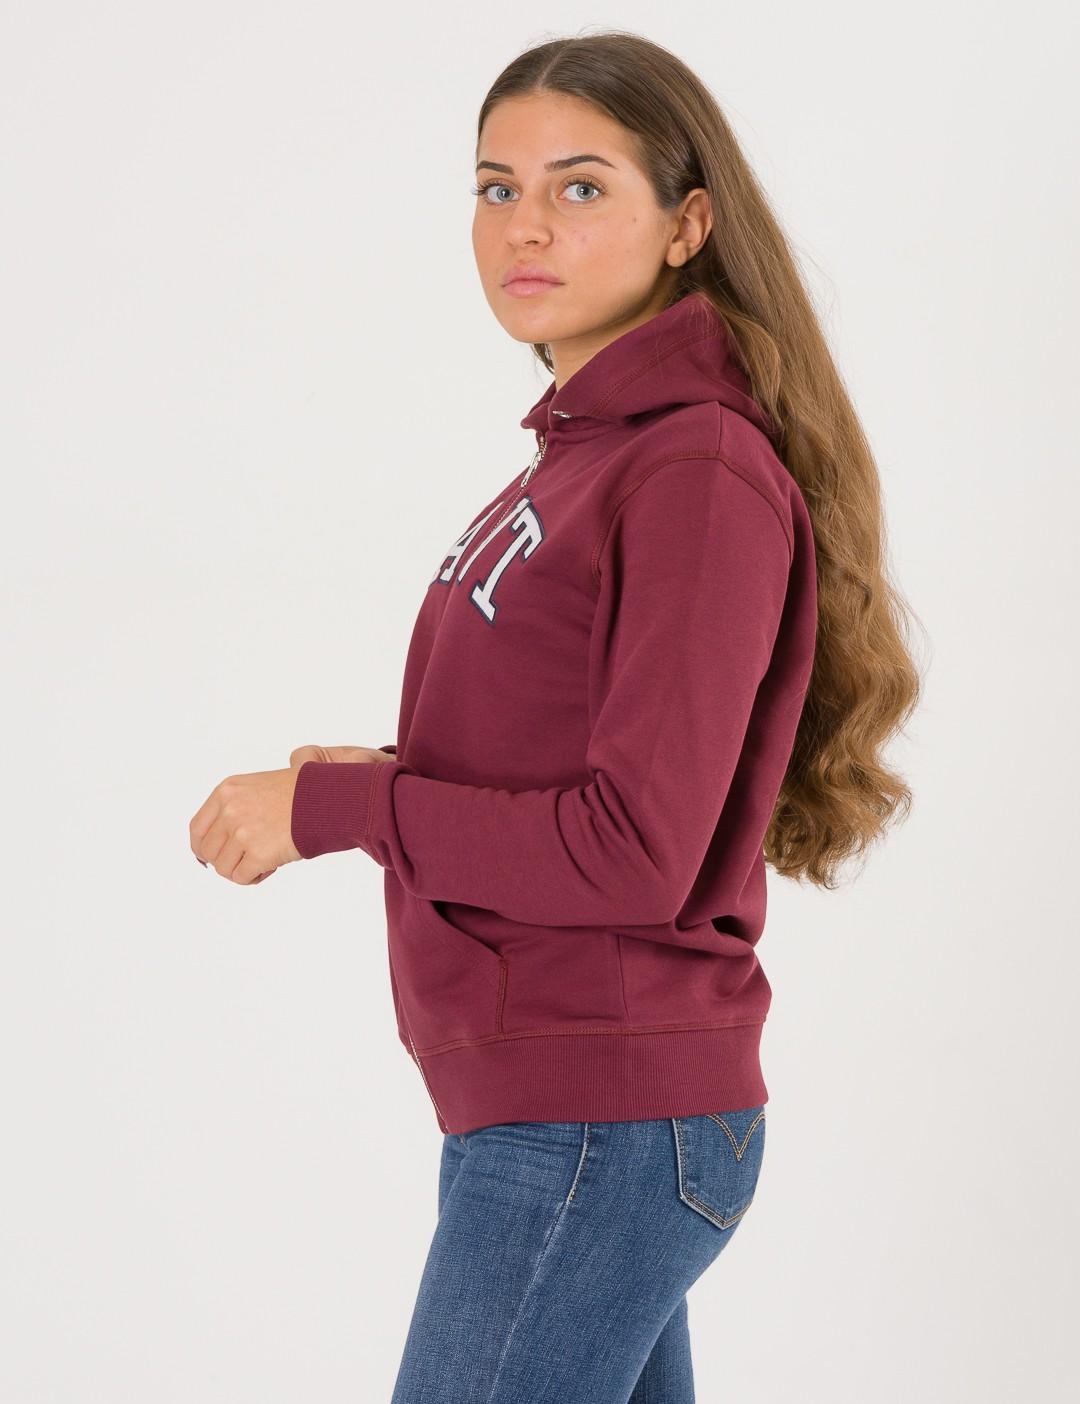 fbfd1424cc5d Om Tb. Gant Full Zip Hoodie - Rød från Gant   KidsBrandStore